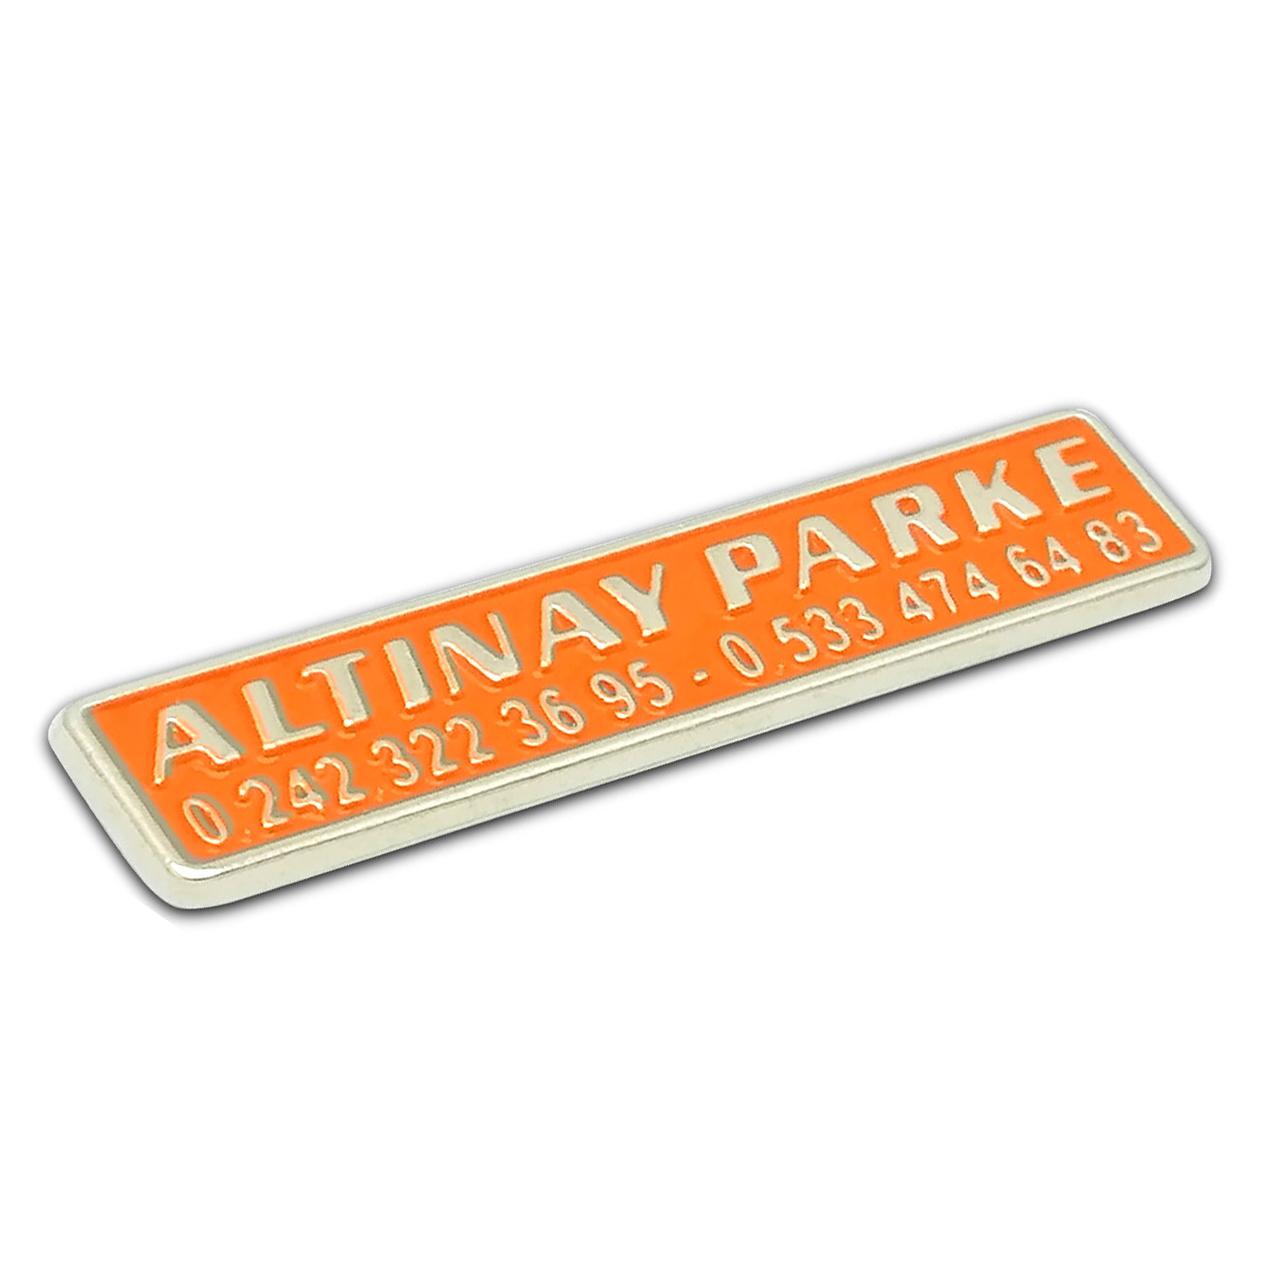 Altınay Parke Metal Döküm Etiket